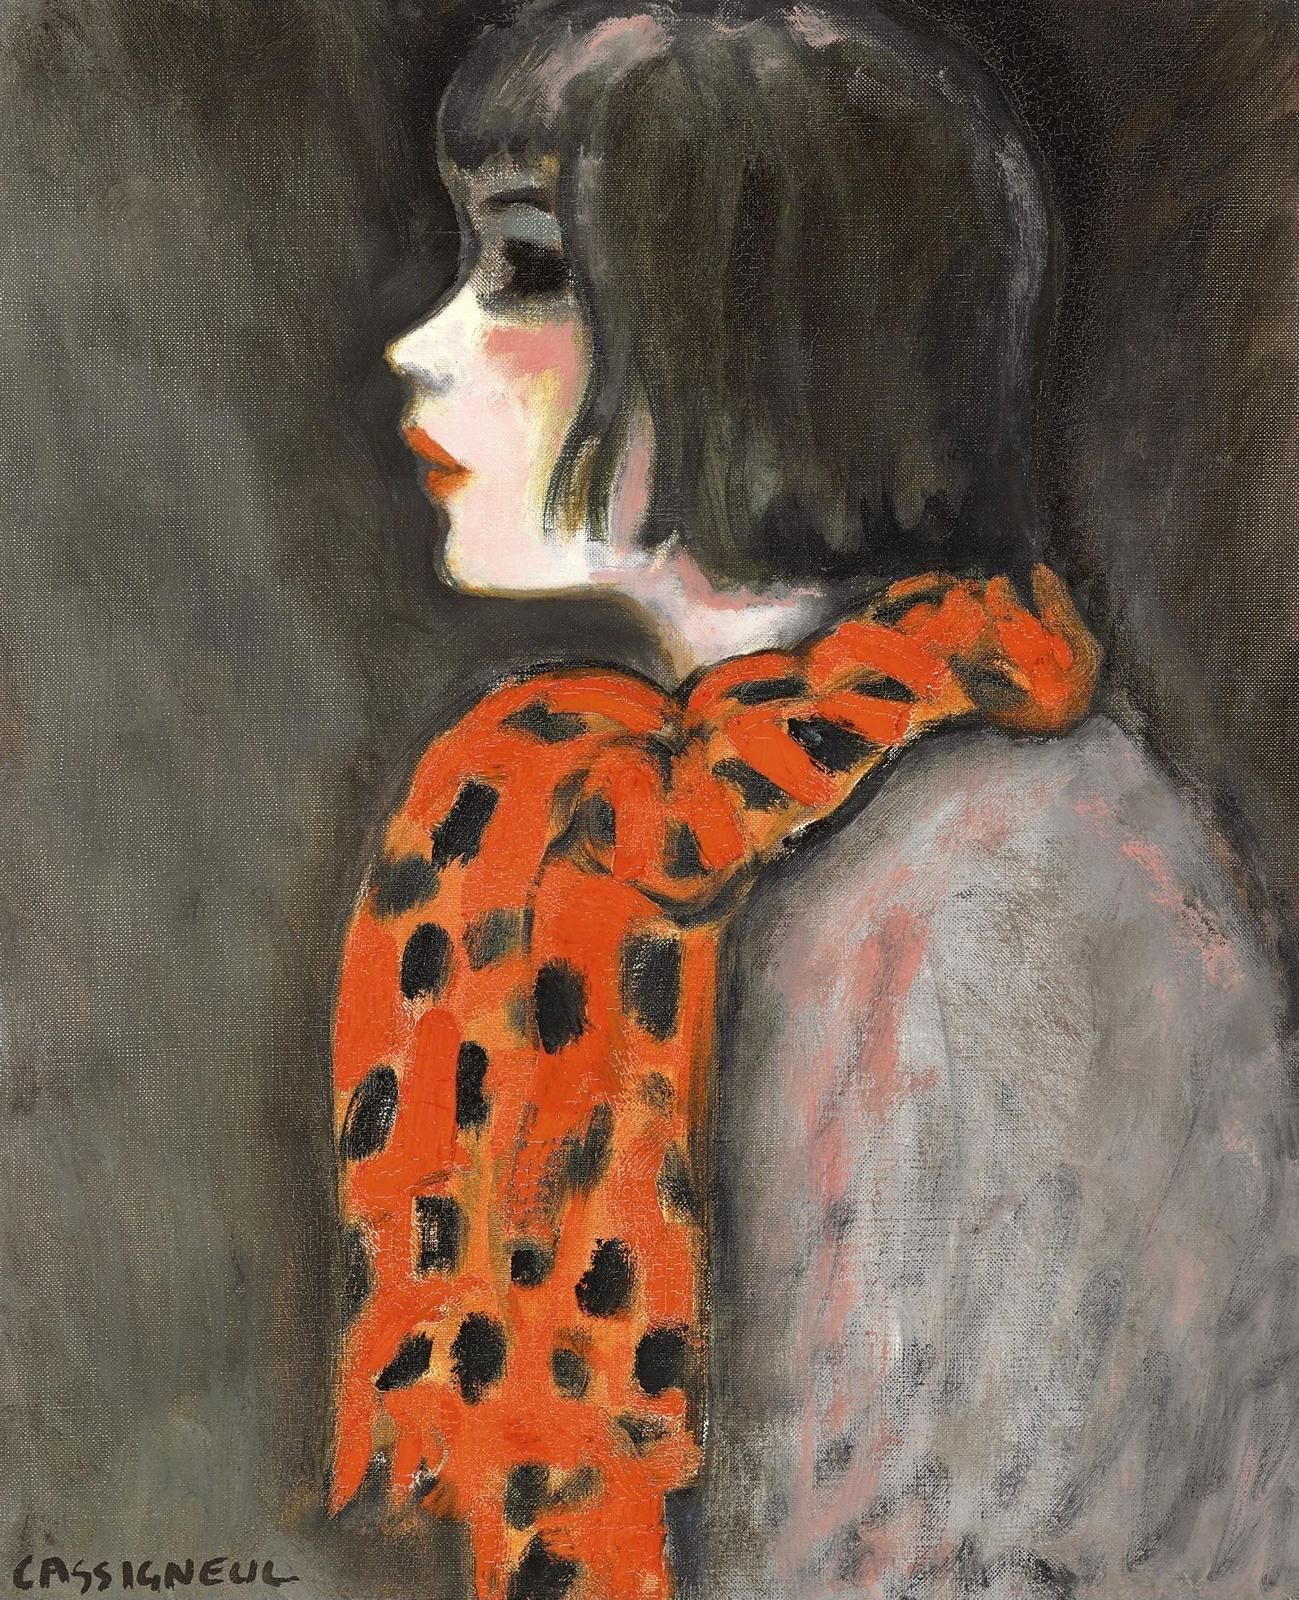 1969__________ ____ (L'echarpe Orange)_54.6 x 45.7__.,_.________ ________.jpg